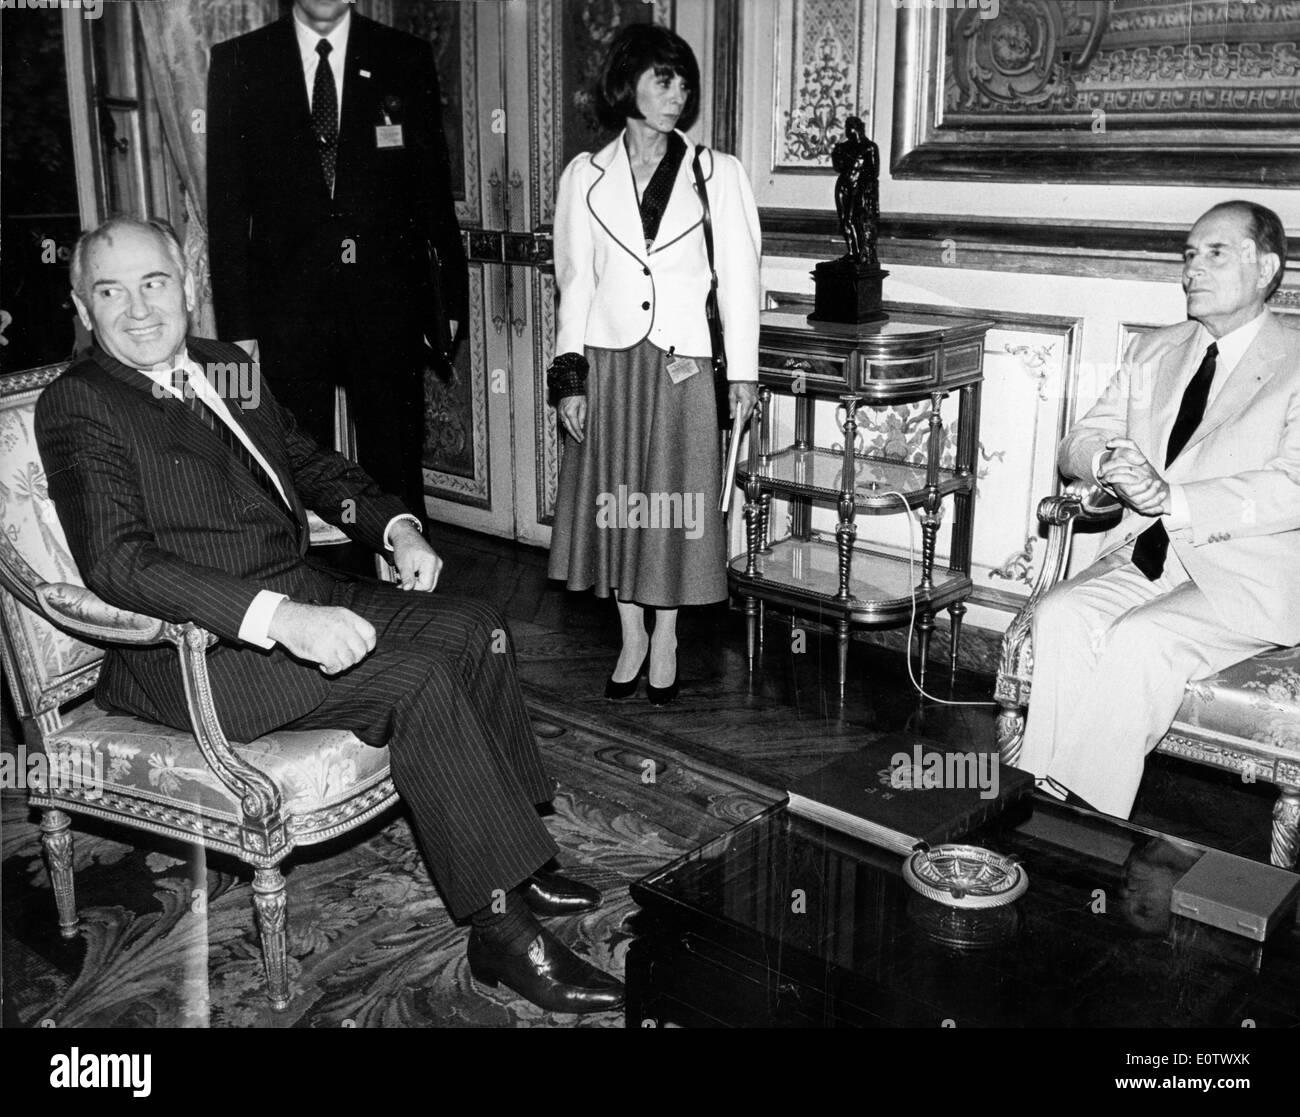 General Secretary Mikhail Gorbachev in a meeting - Stock Image